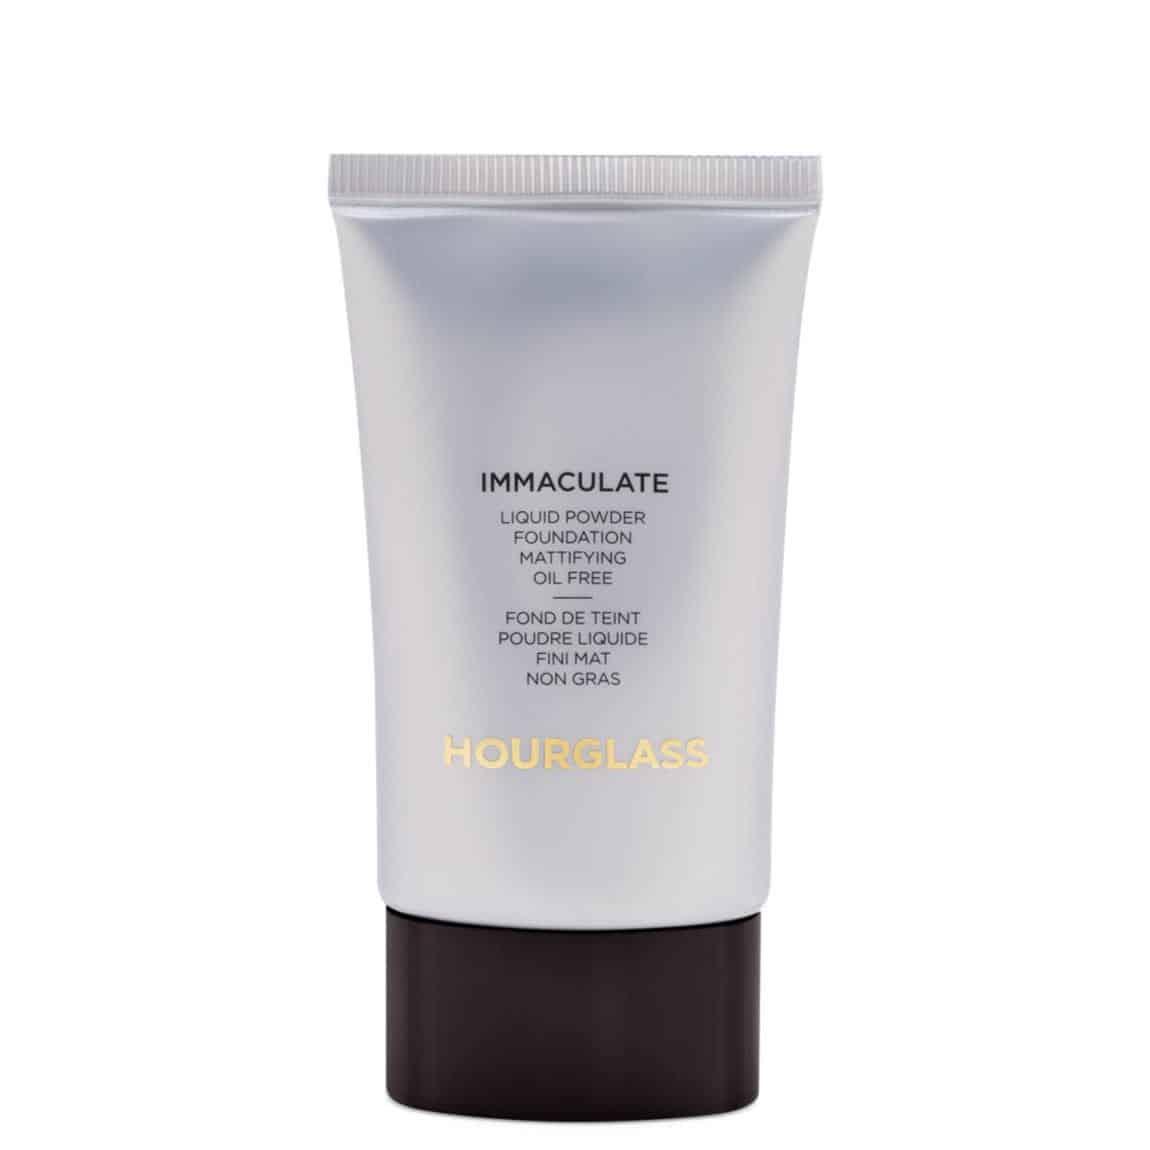 منتج Immaculate Liquid Powder Foundation Mattifying Oil Free من أورغلاس Hourglass